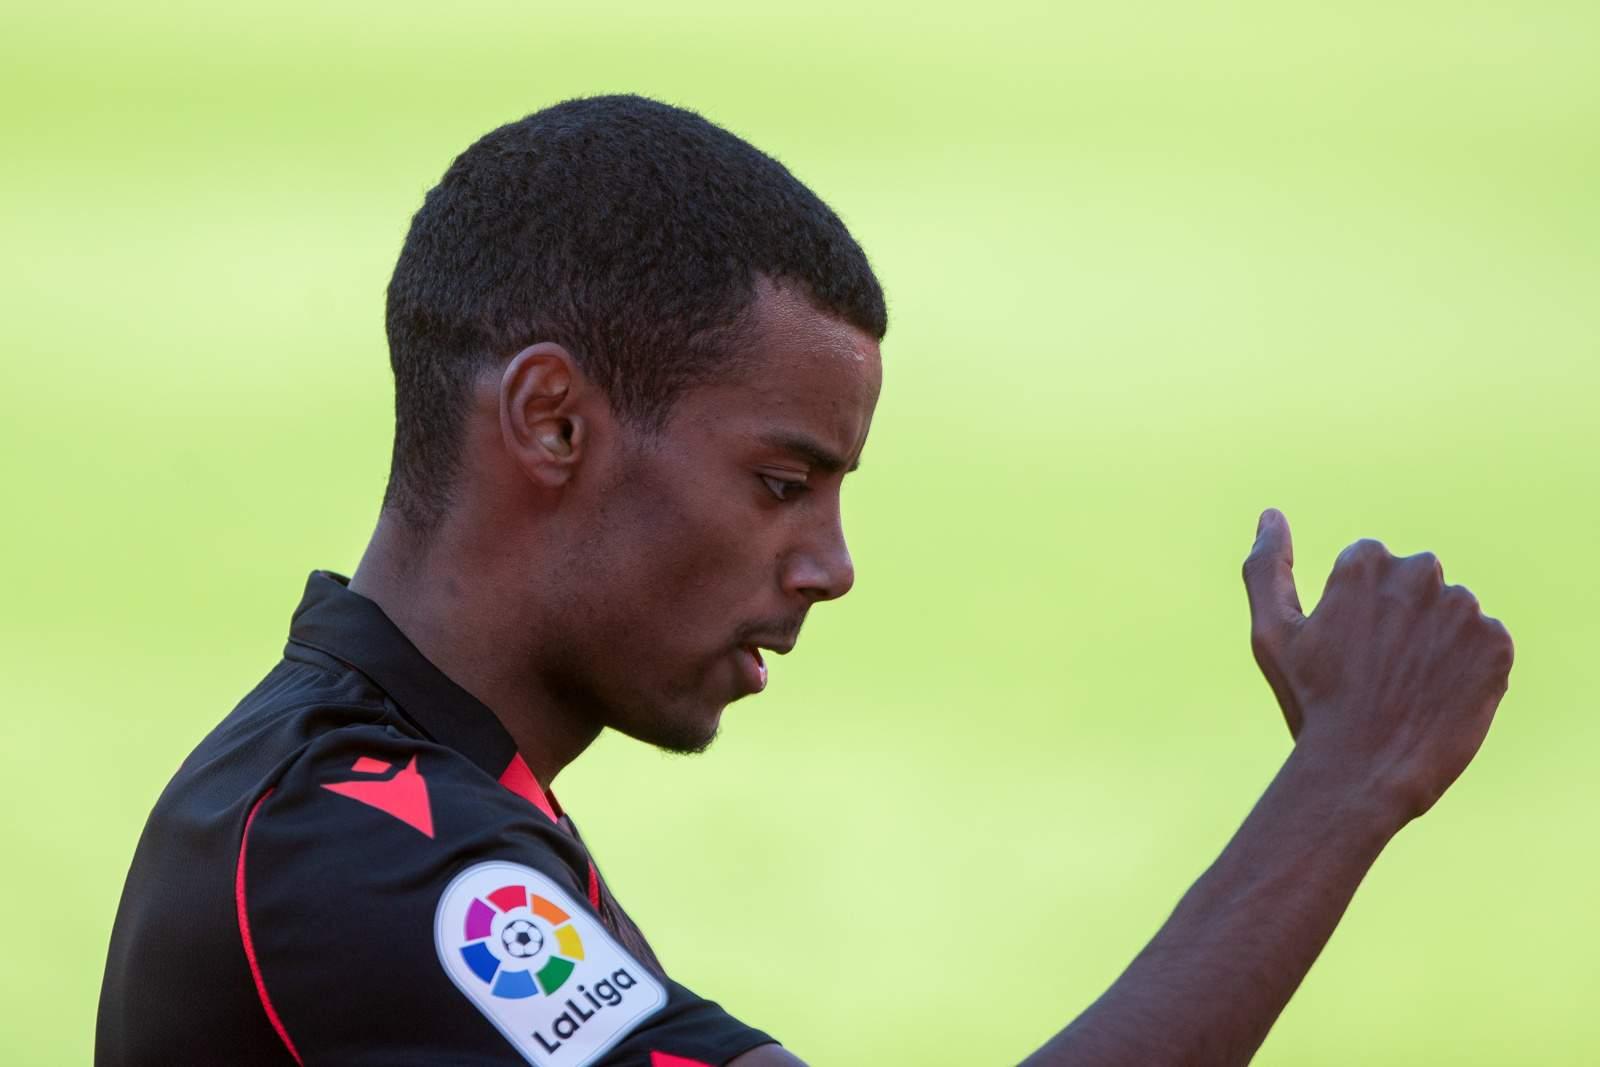 Хет-трик Исака помог «Реал Сосьедаду» разгромить «Алавес»